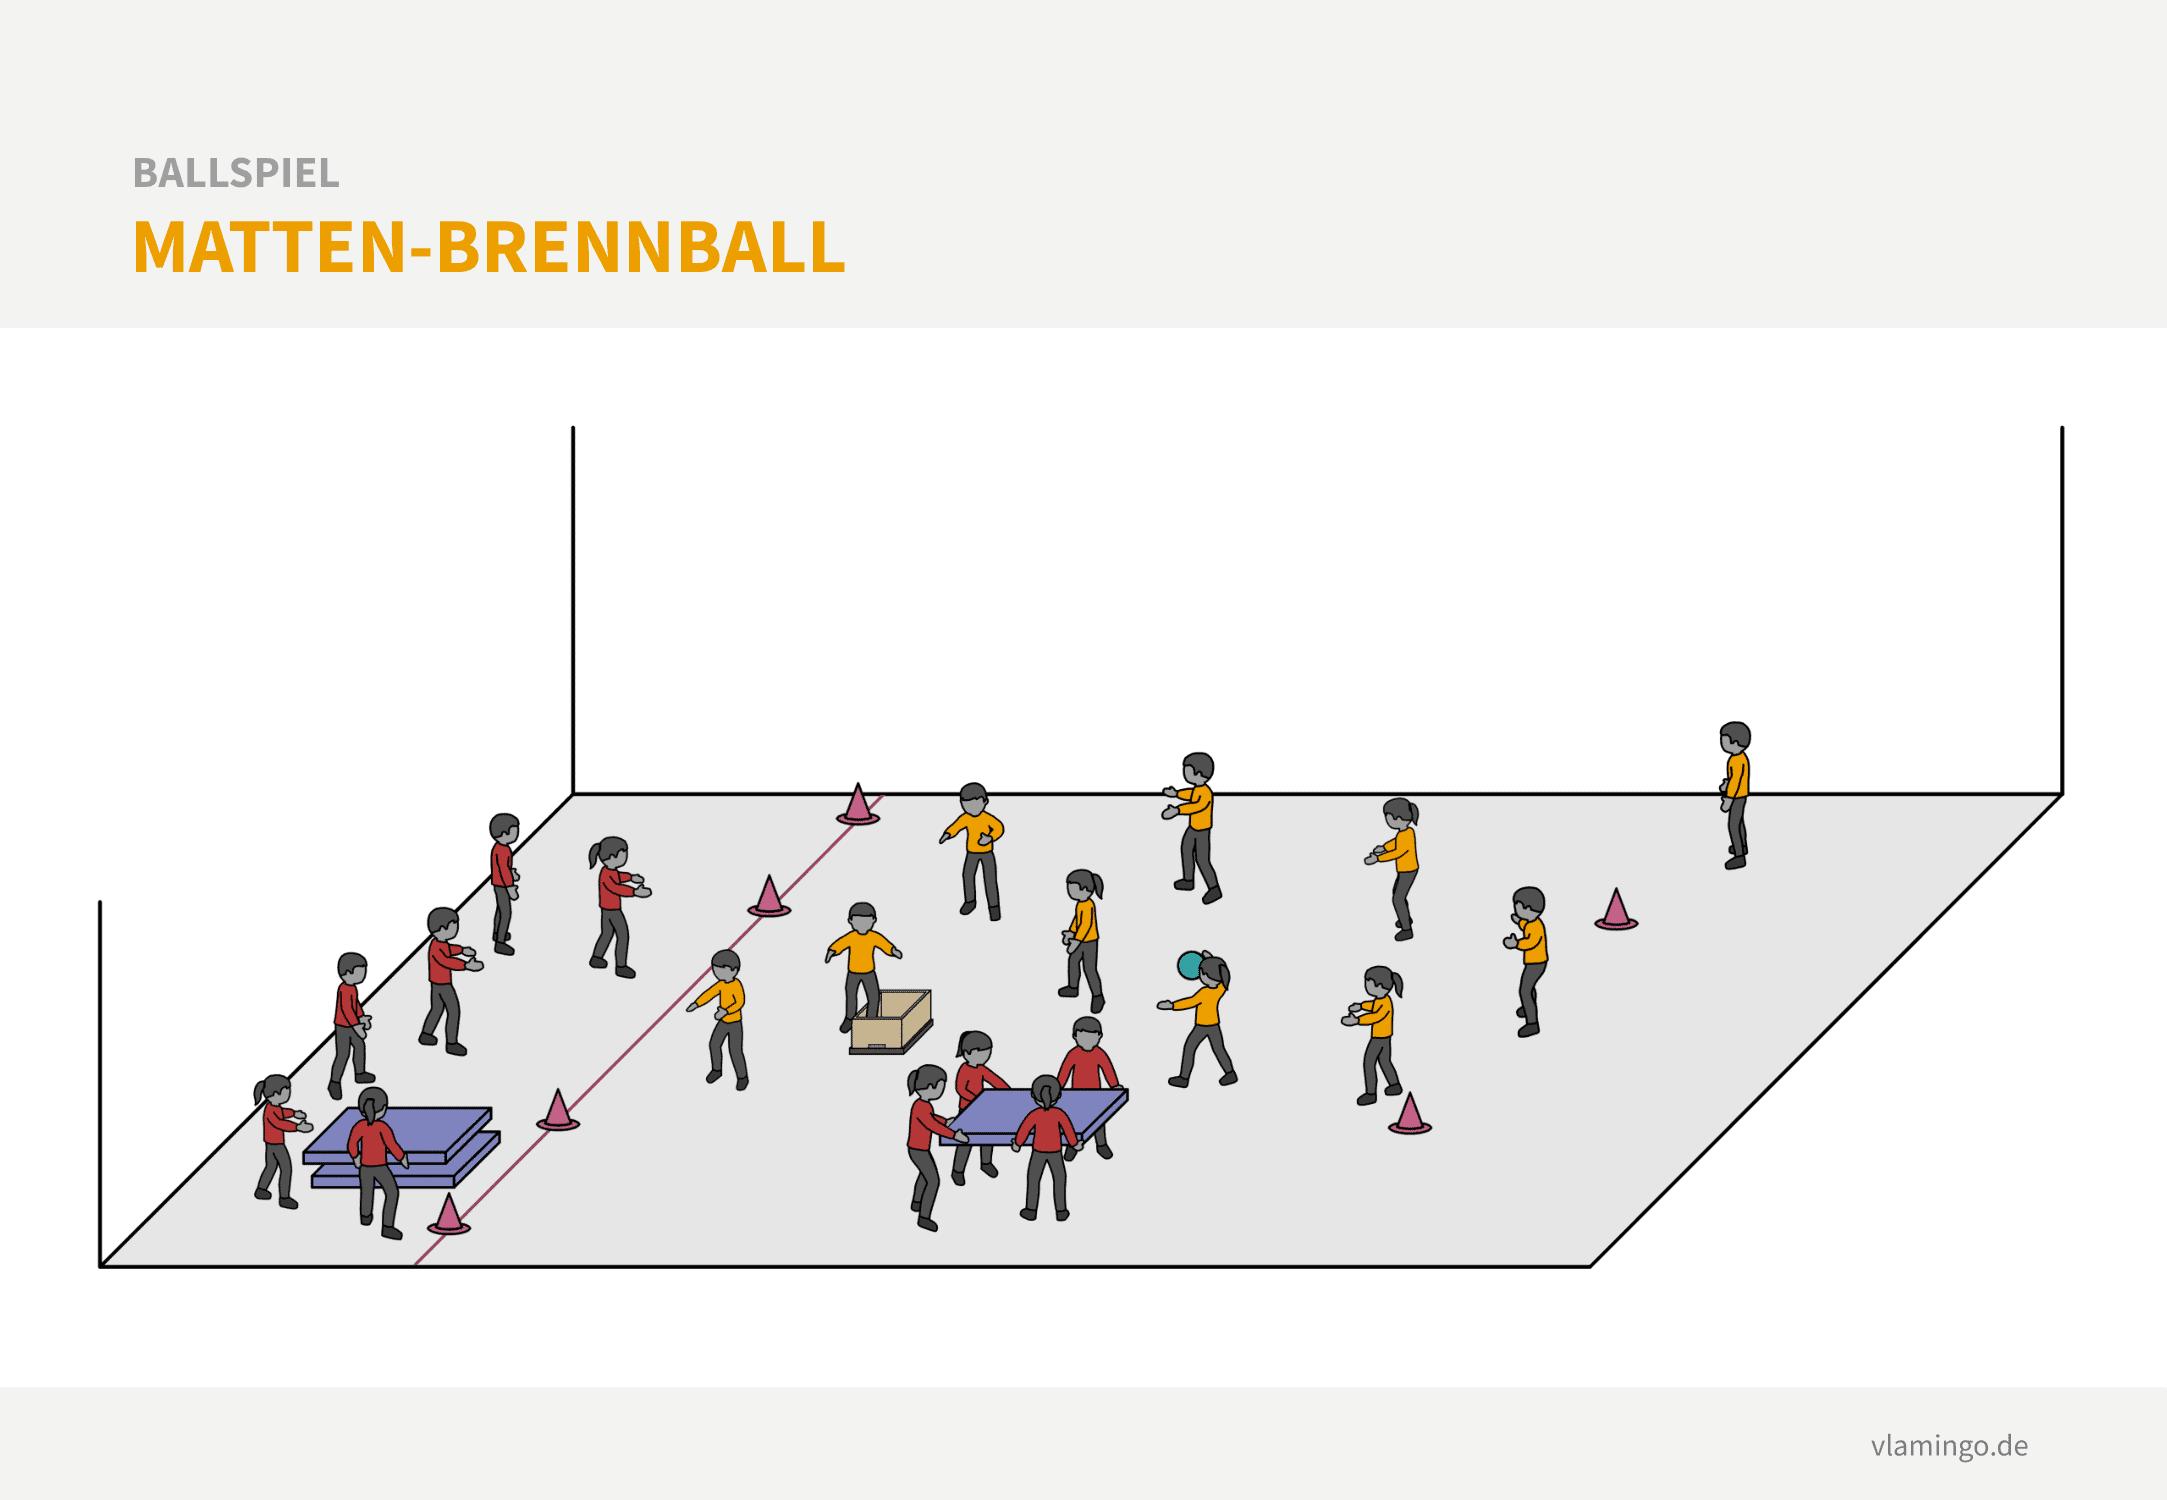 Variante: Matten-Brennball